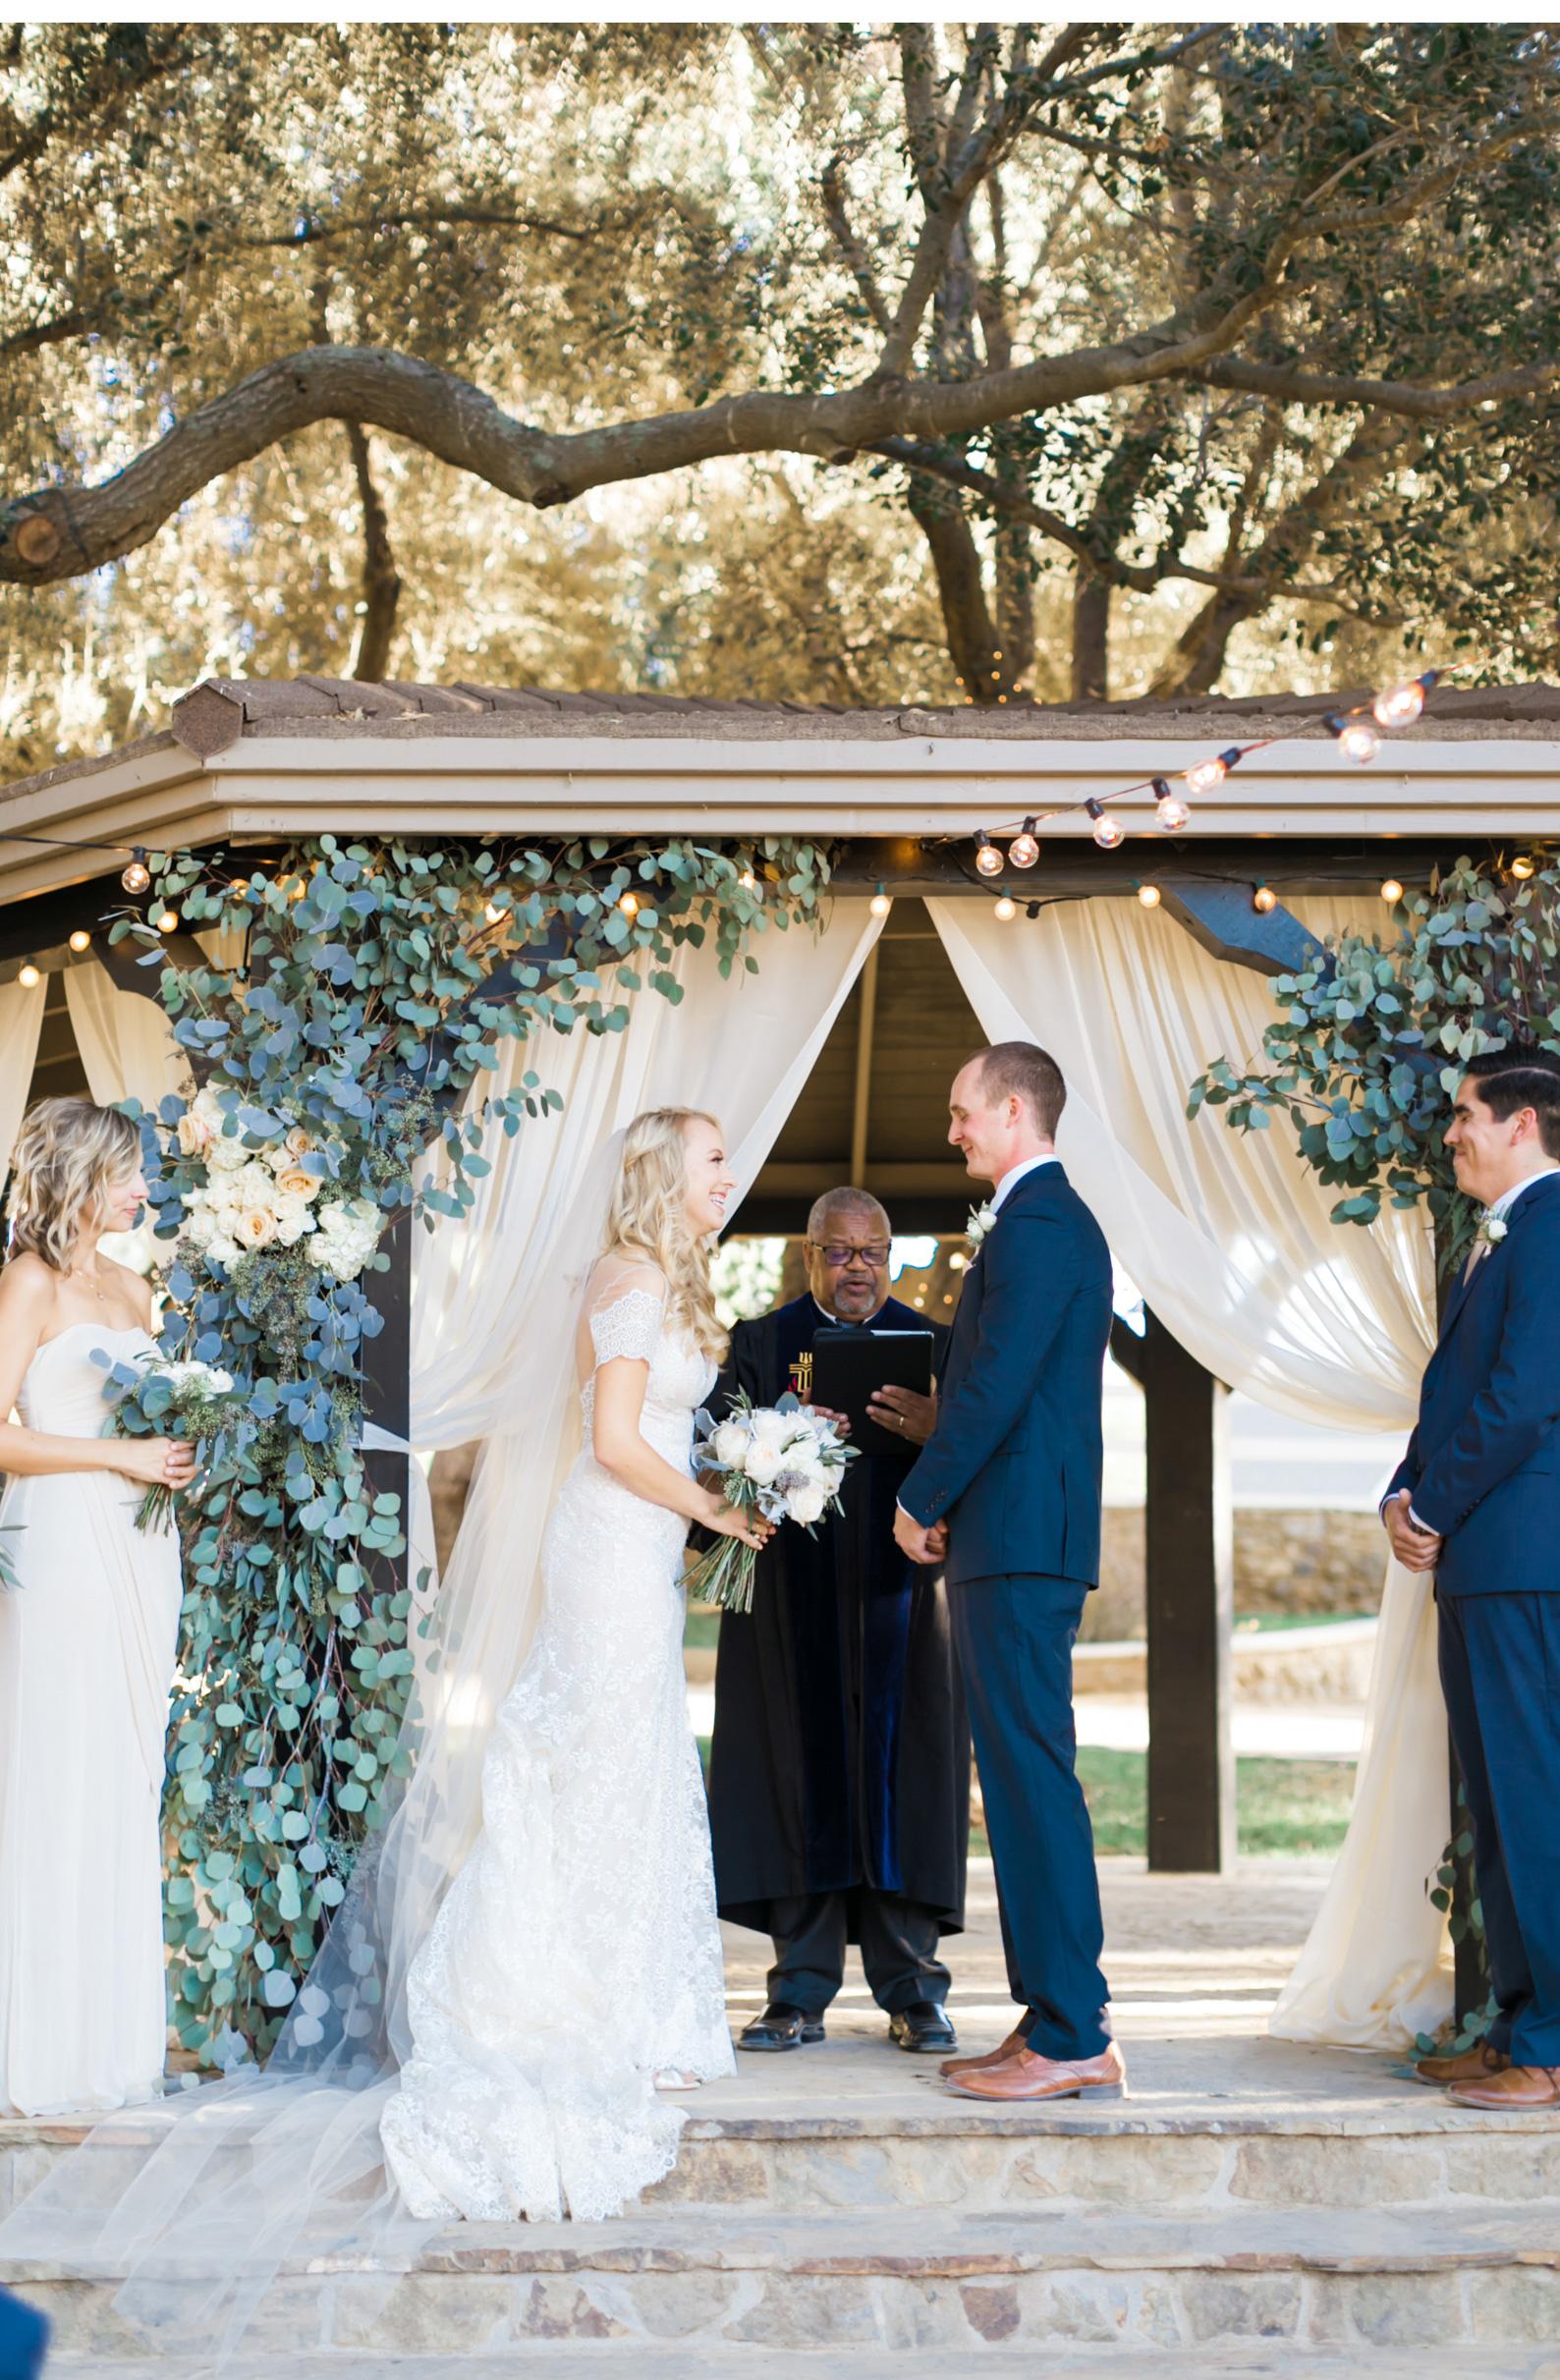 Style-Me-Pretty-Wedding-Photographer-Natalie-Schutt-Photography-Calfornia-San-Luis-Obispo_04.jpg